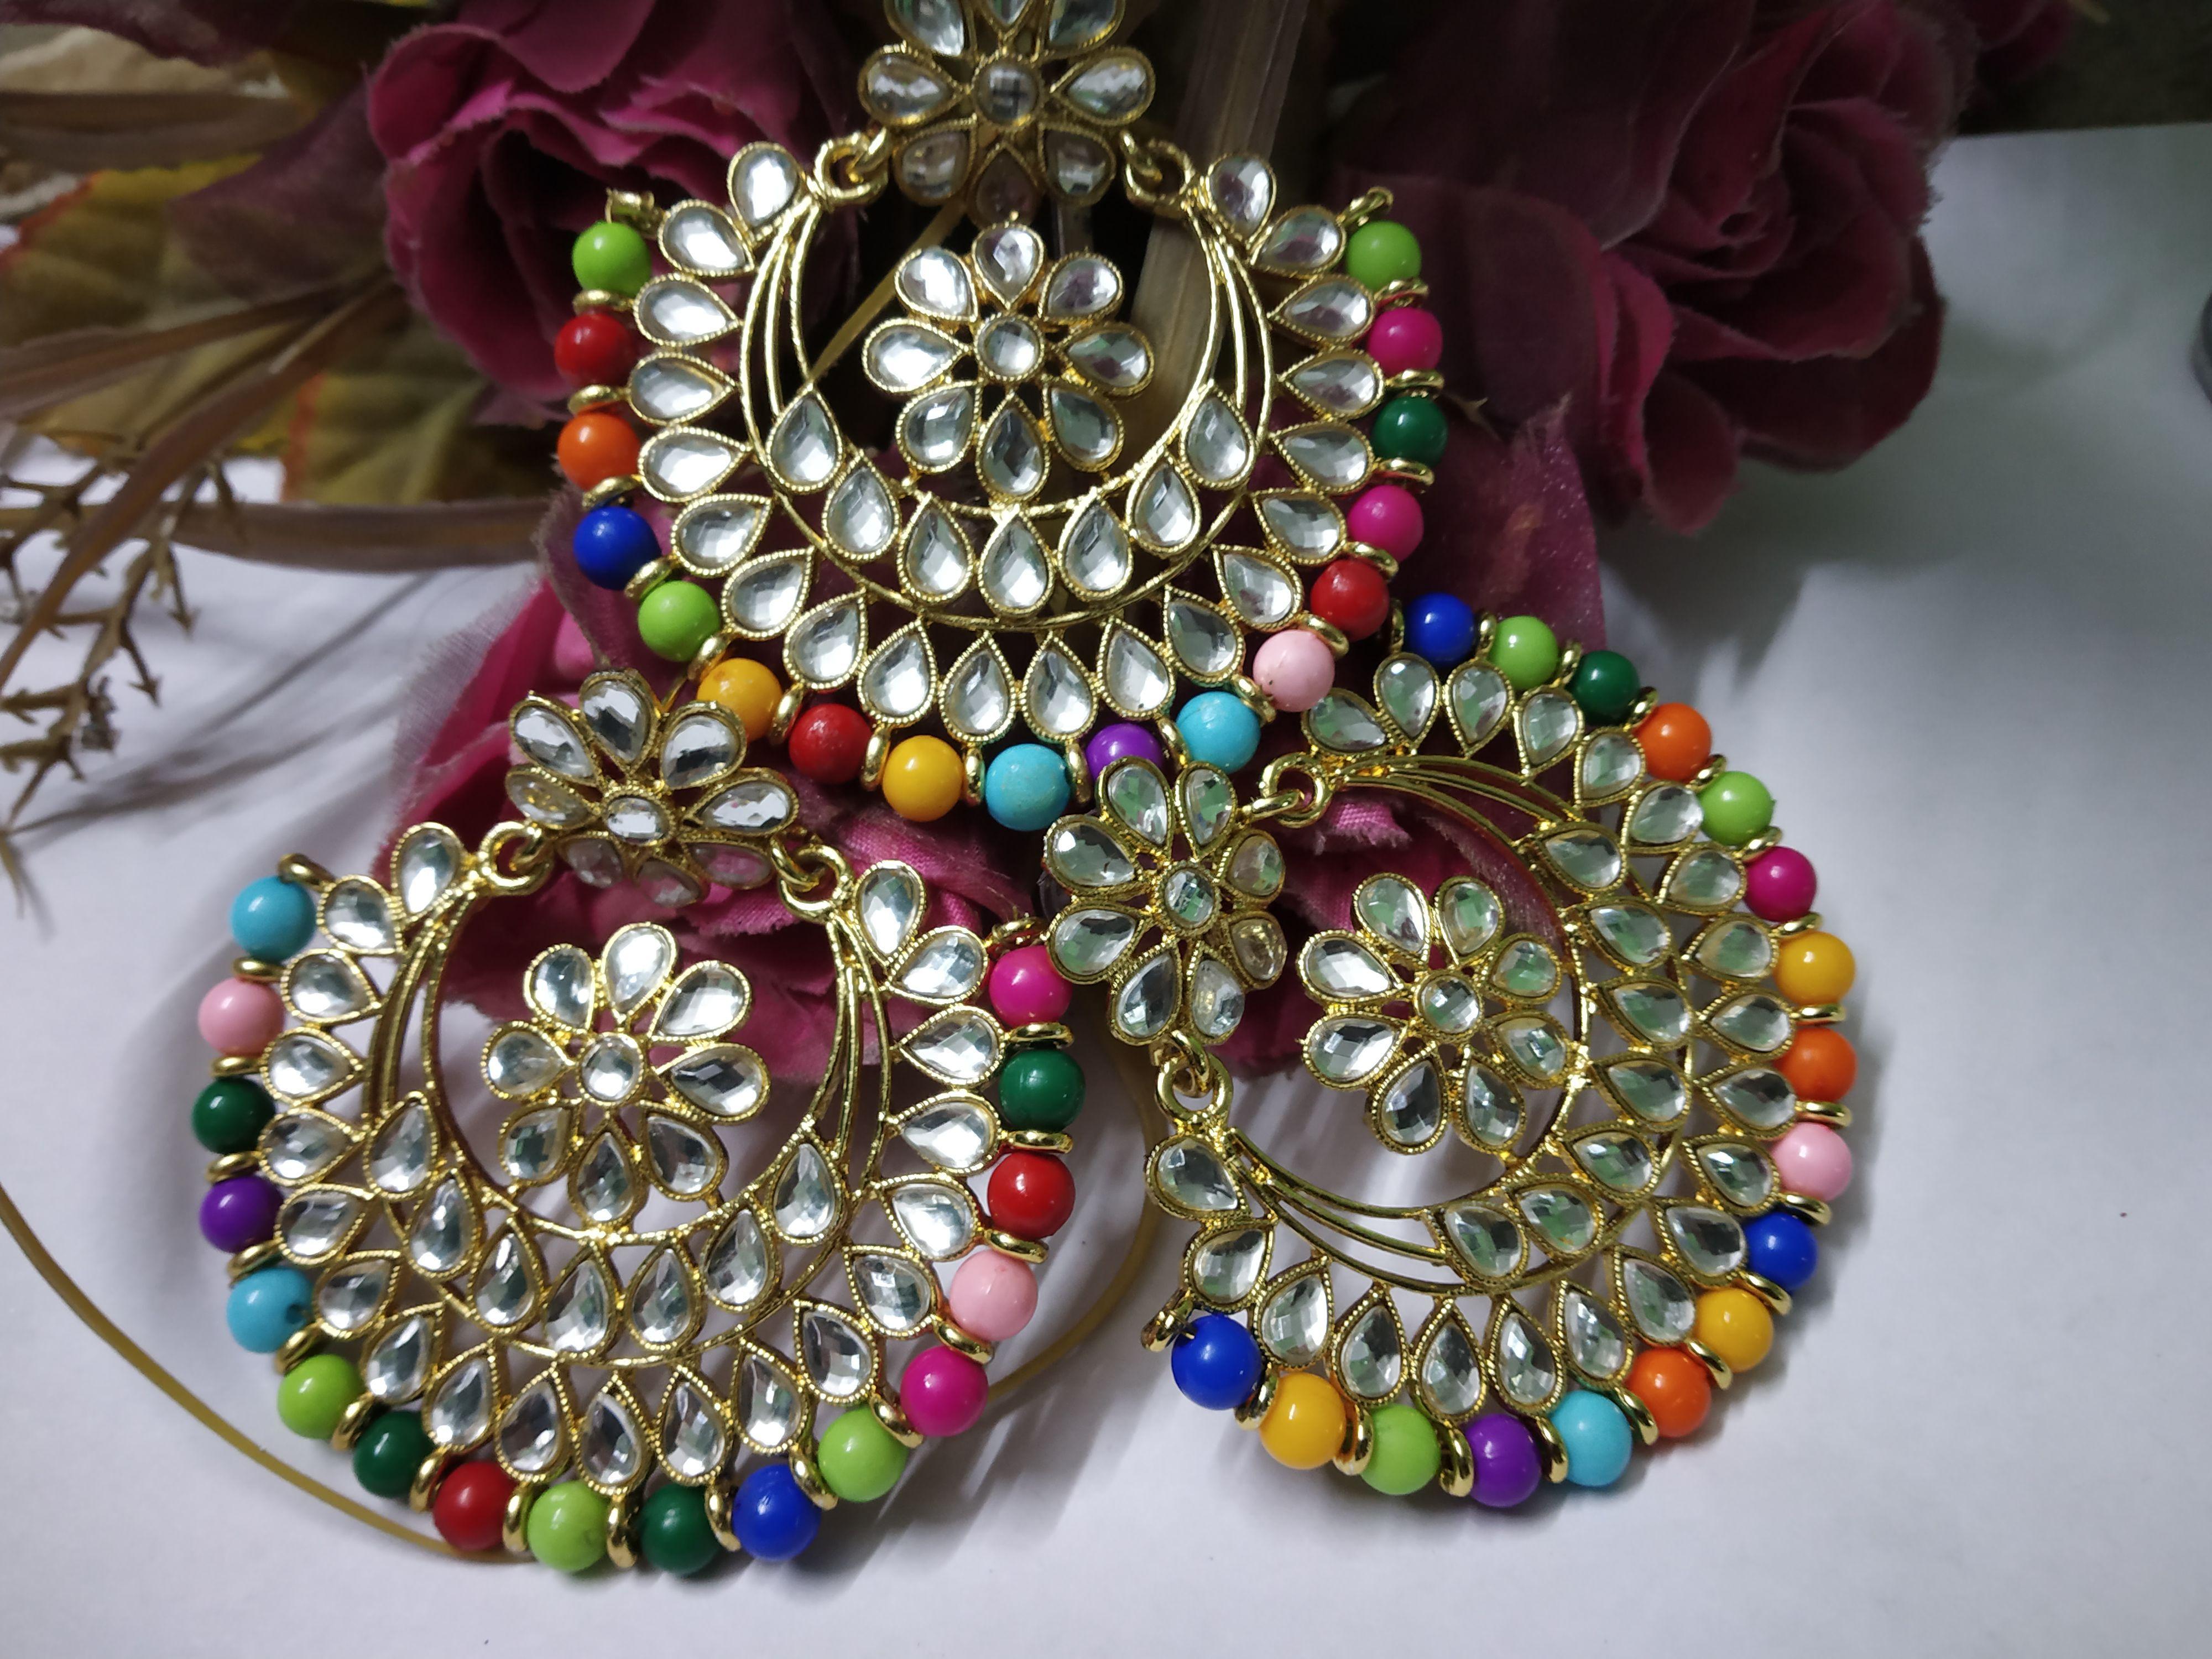 Wedding Earrings And Mang Tika Set Buy Wedding Earrings And Mang